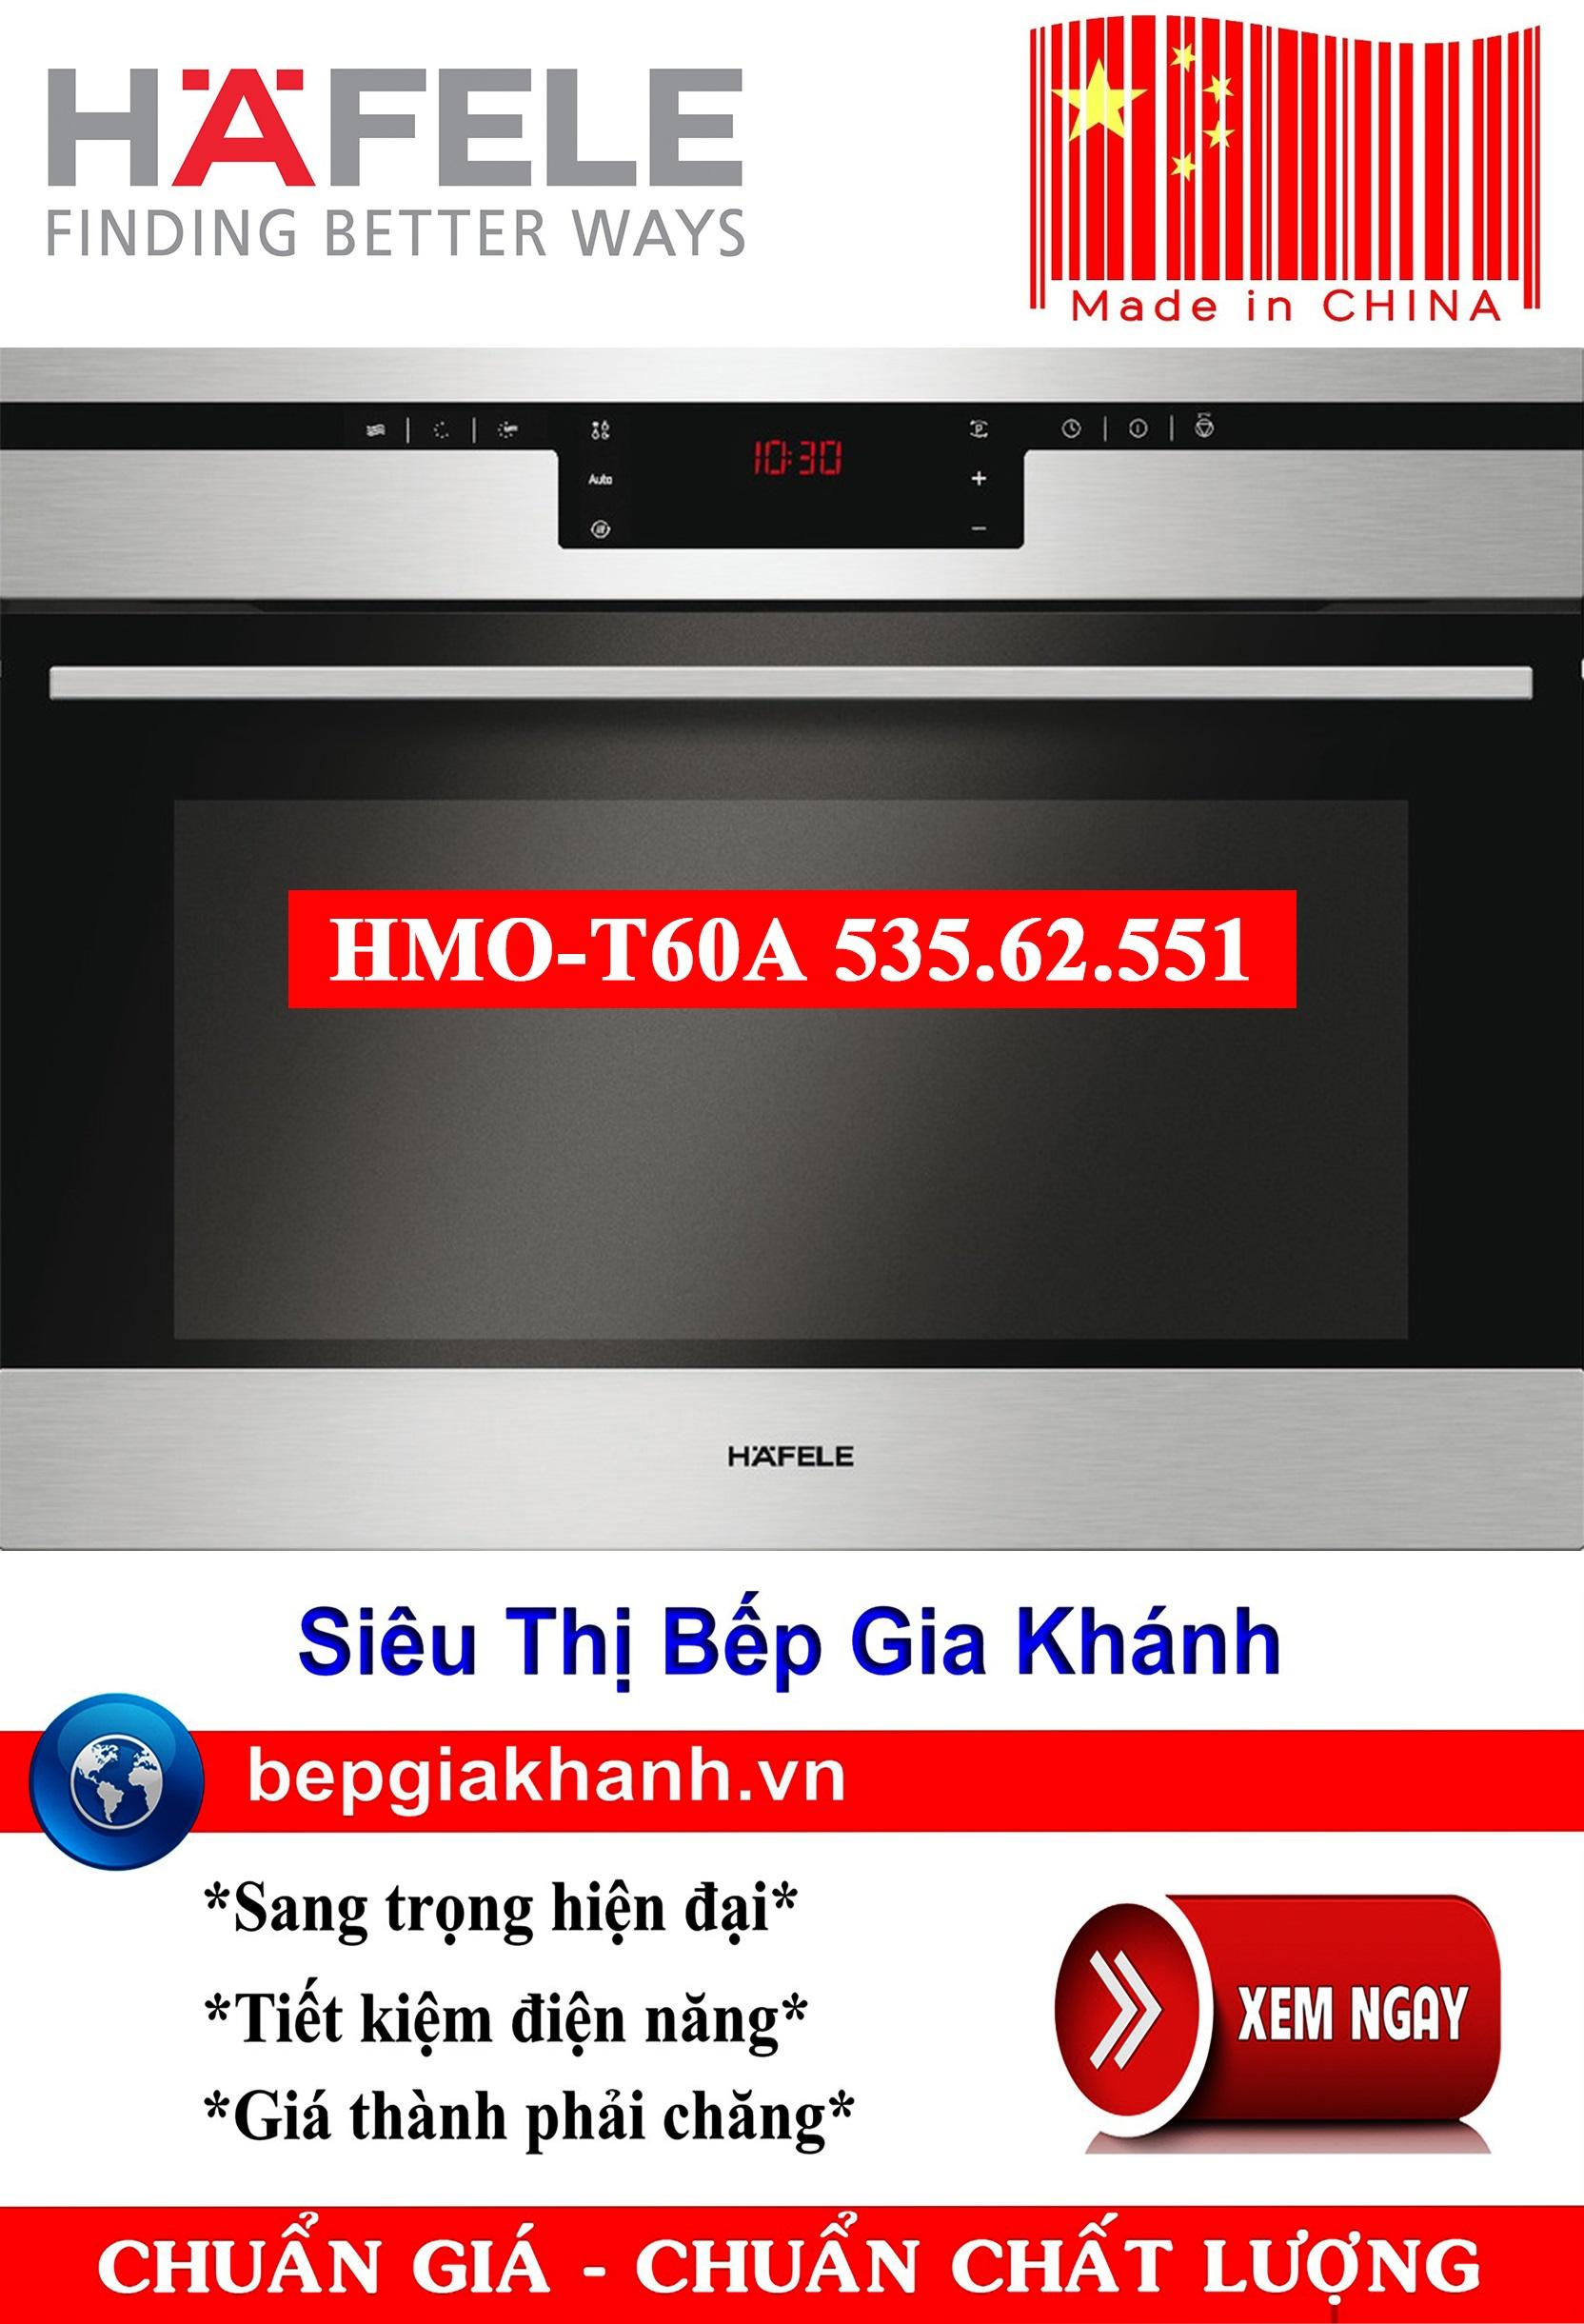 Lò nướng kèm vi sóng Hafele HMO-T60A 535.62.551 sản xuất Trung Quốc, lò nướng, lò nướng điện, lò nướng điện đa năng, lò nướng mini, lò nướng bánh, lò nướng lock and lock, lo nuong, lo nuong dien da nang